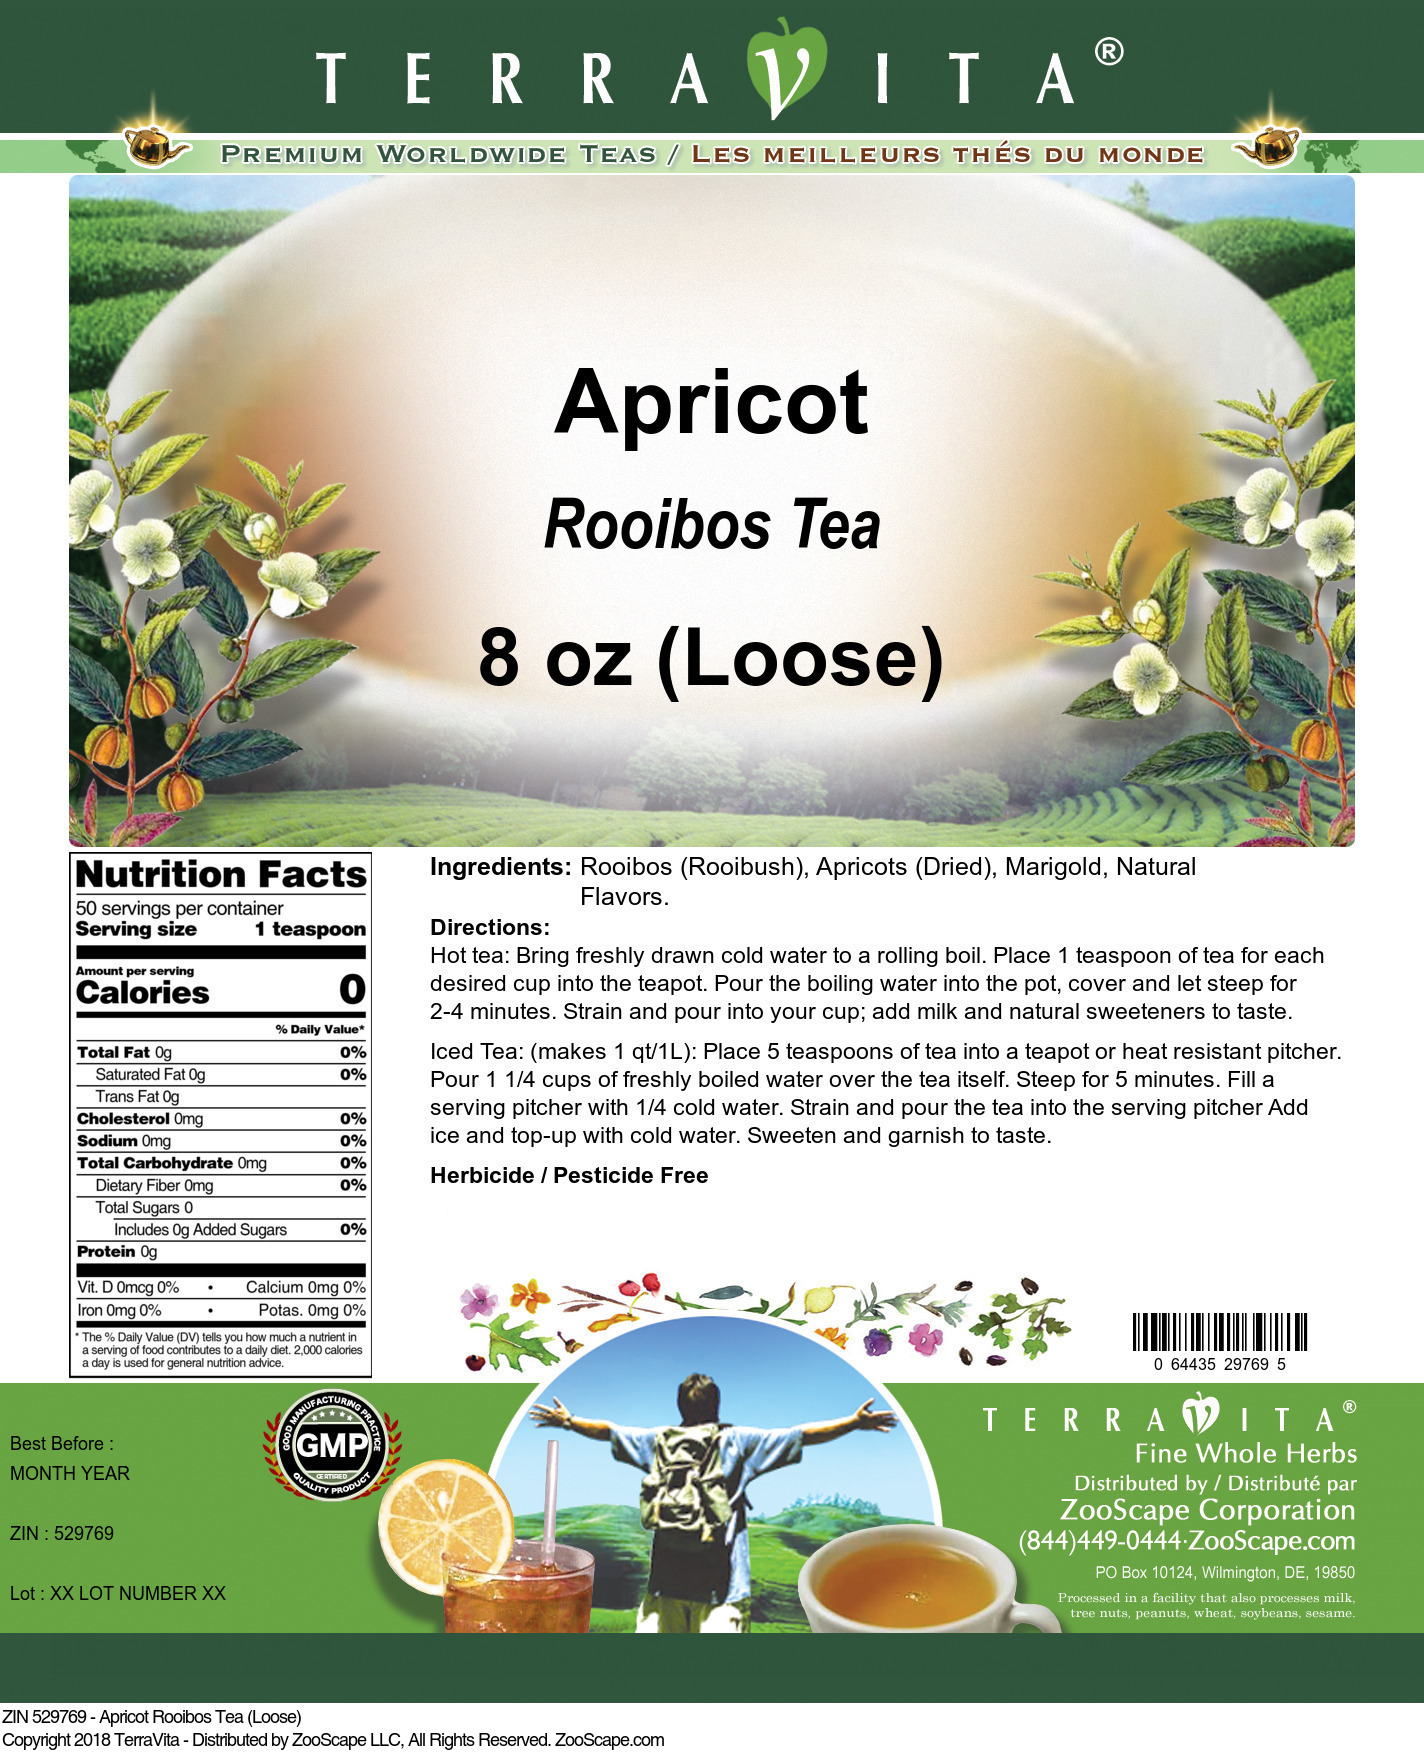 Apricot Rooibos Tea